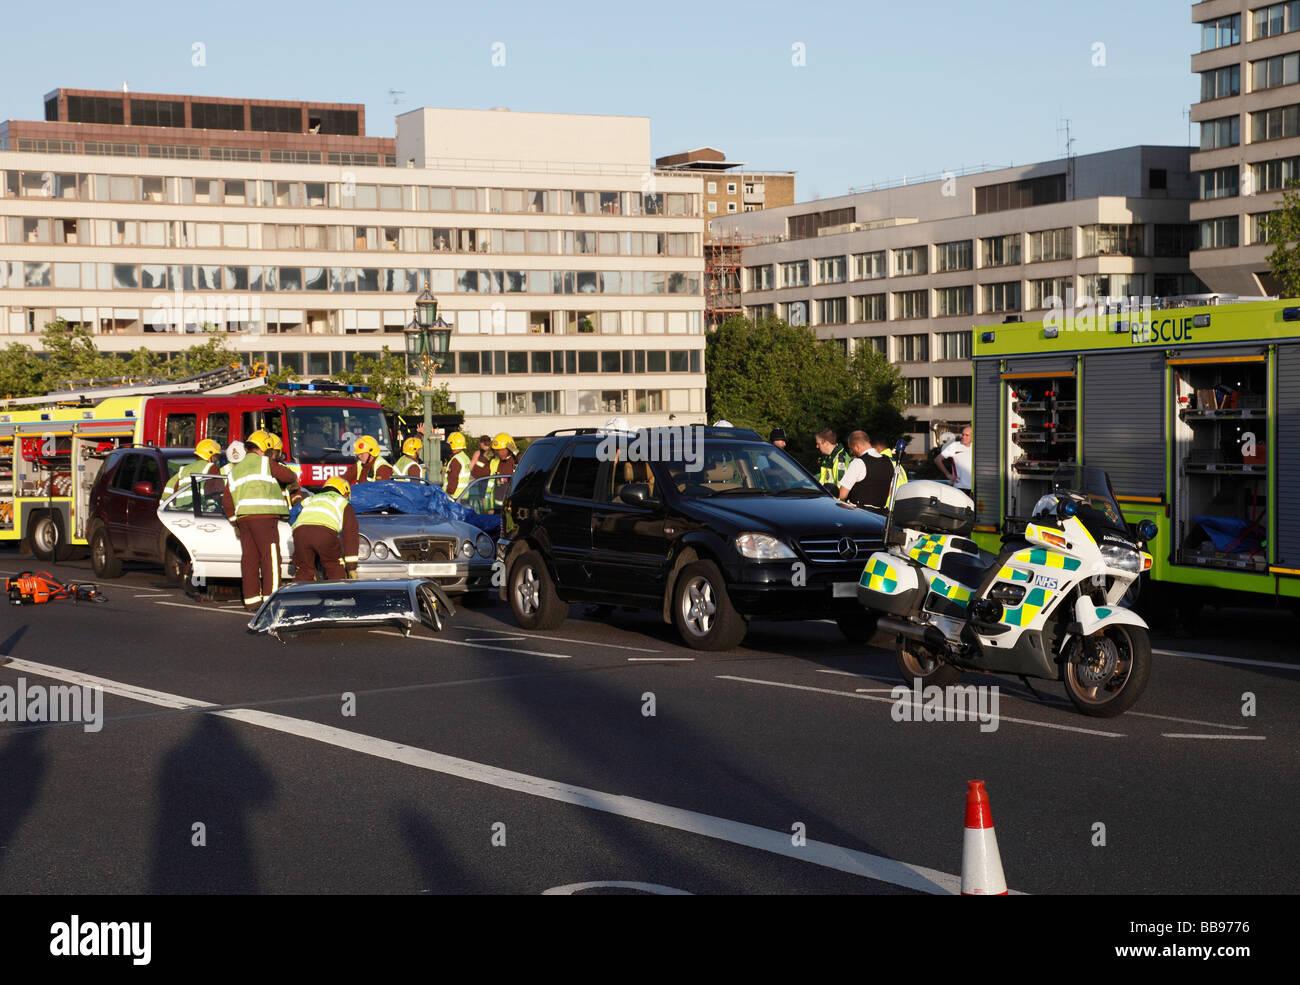 Motorbike Accident London Stock Photos & Motorbike Accident